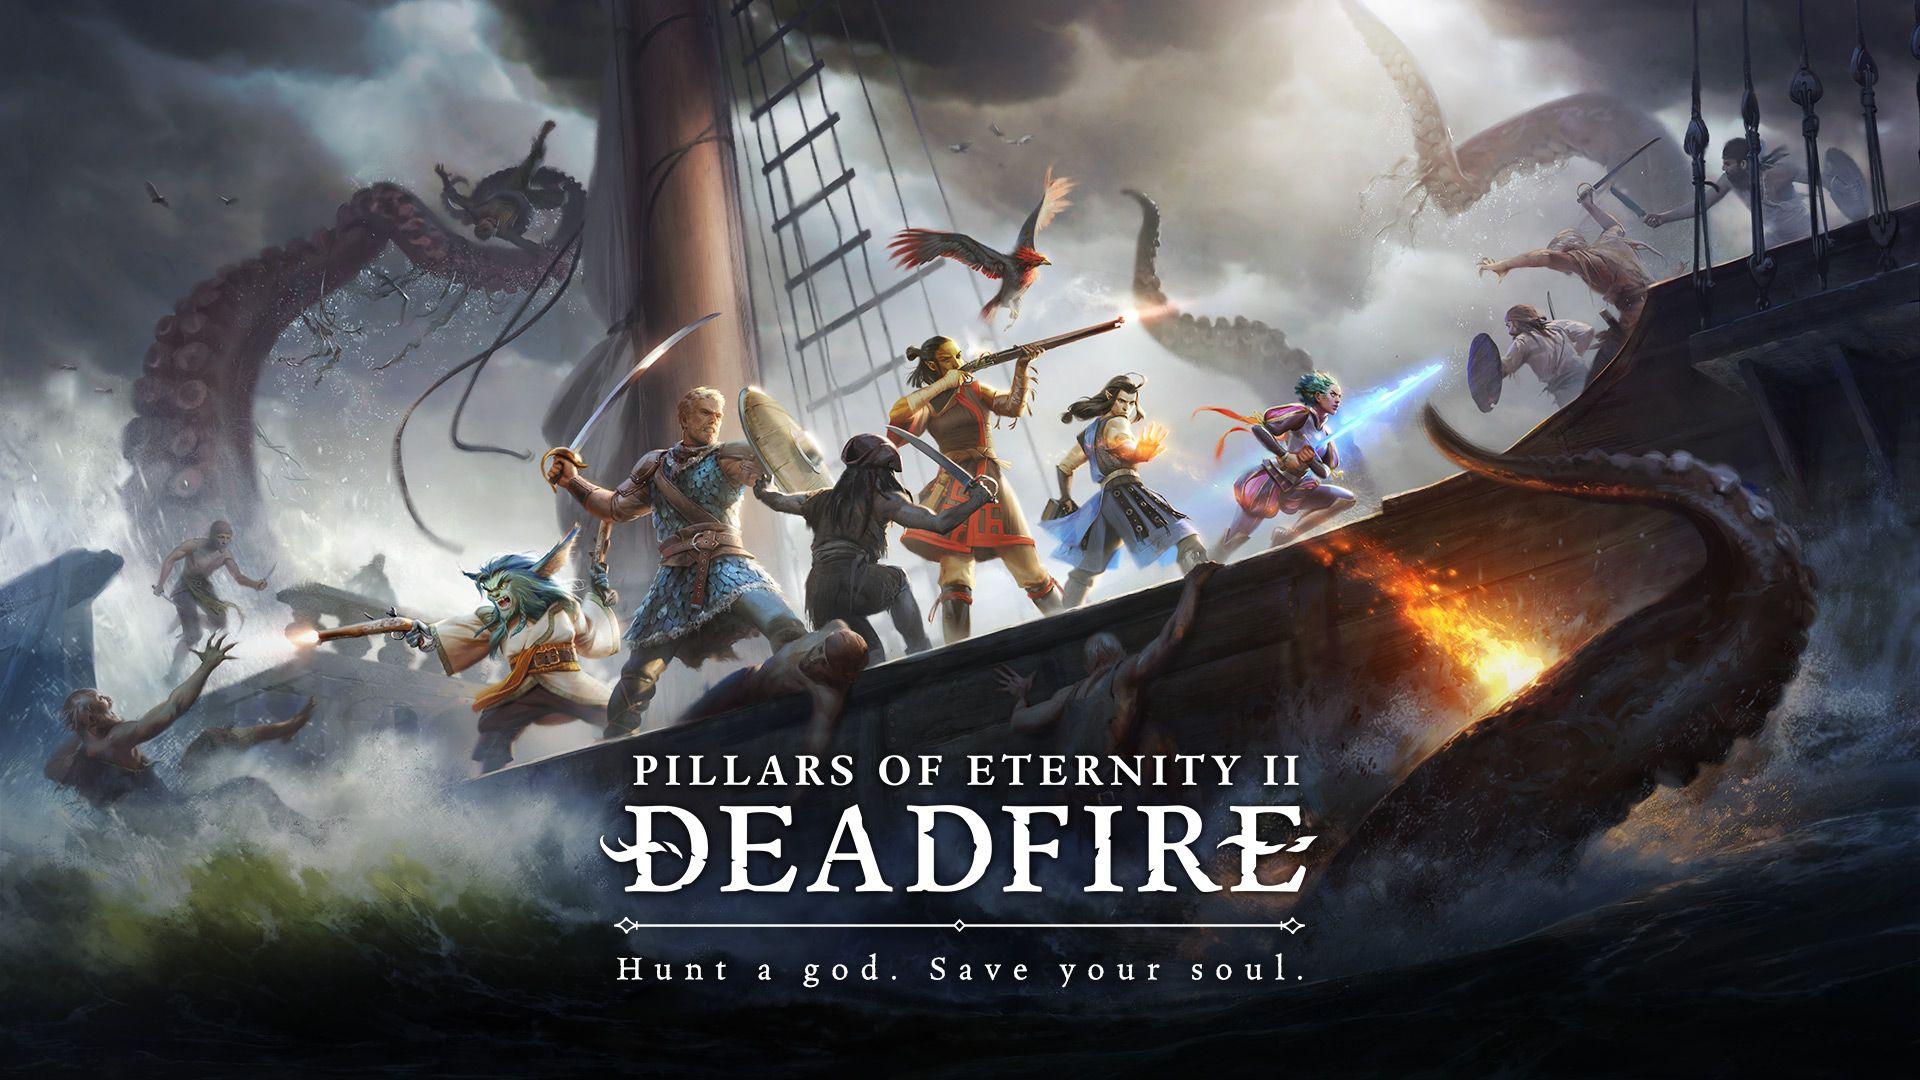 Pillars of Eternity 2: Deadfire tek u svibnju